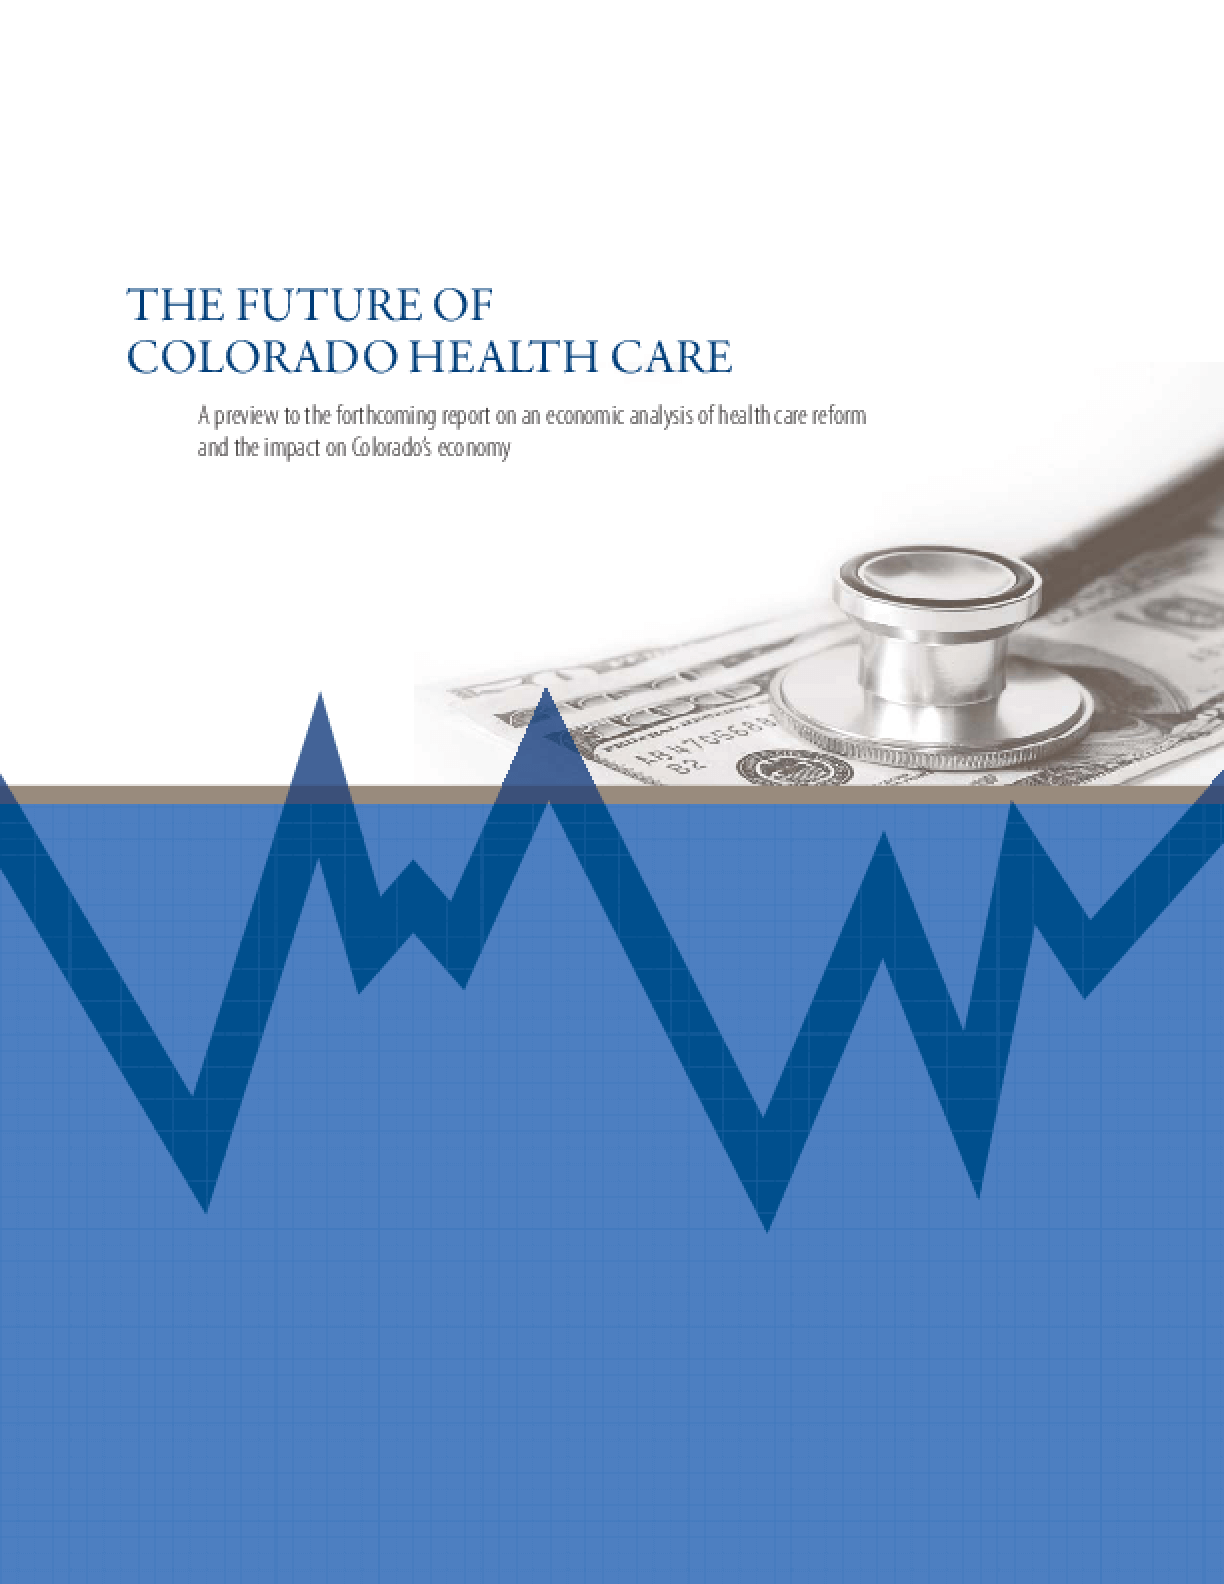 The Future of Colorado Health Care